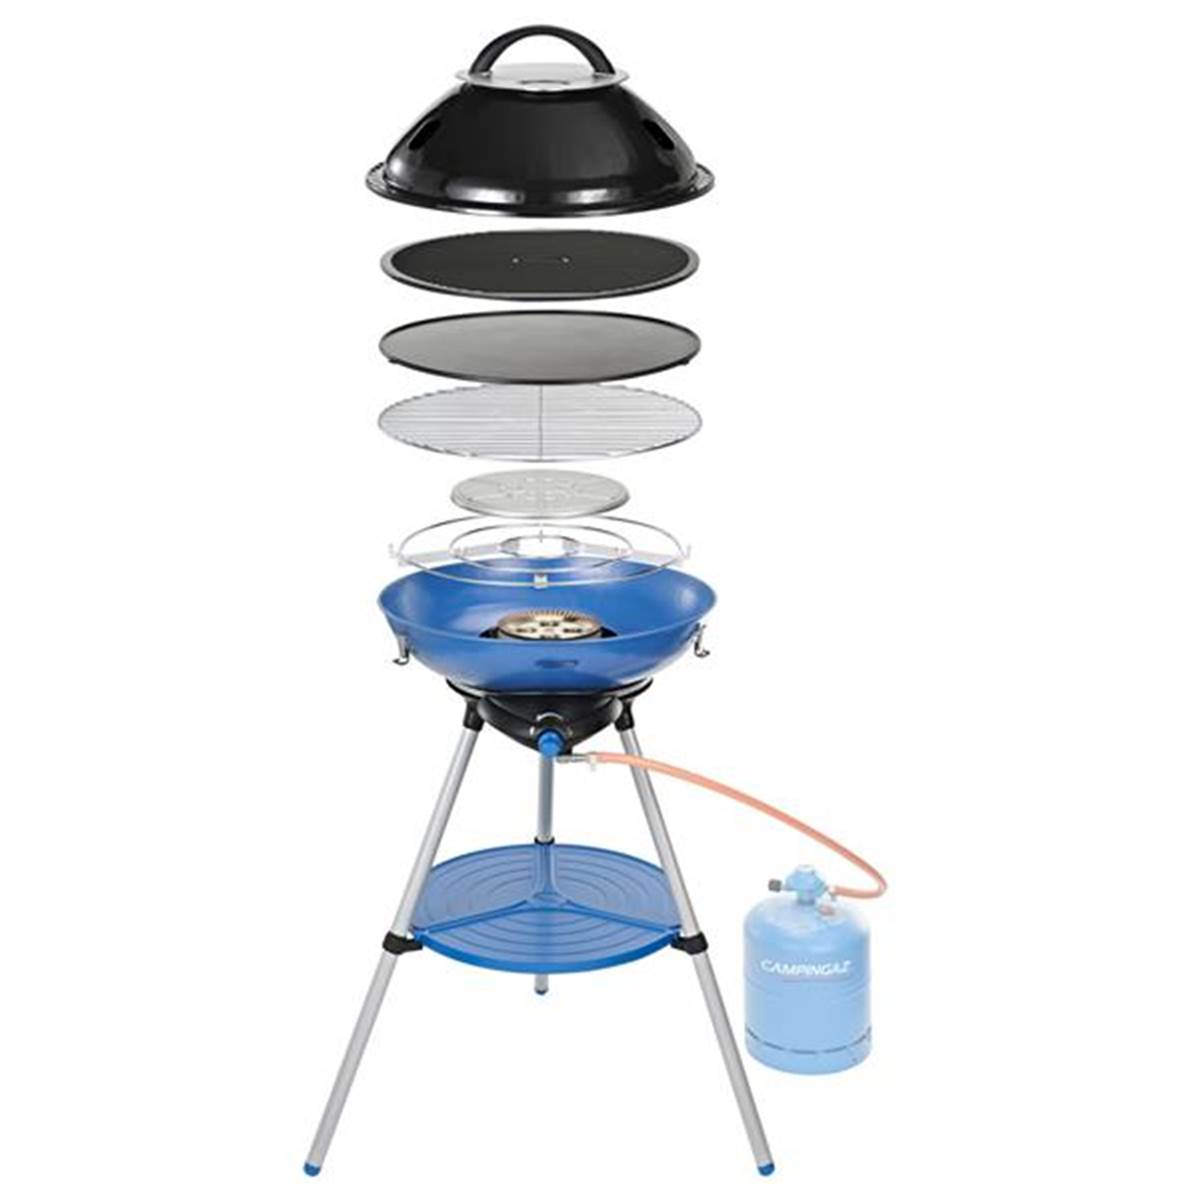 Party Grill PG600 Campingaz Shop